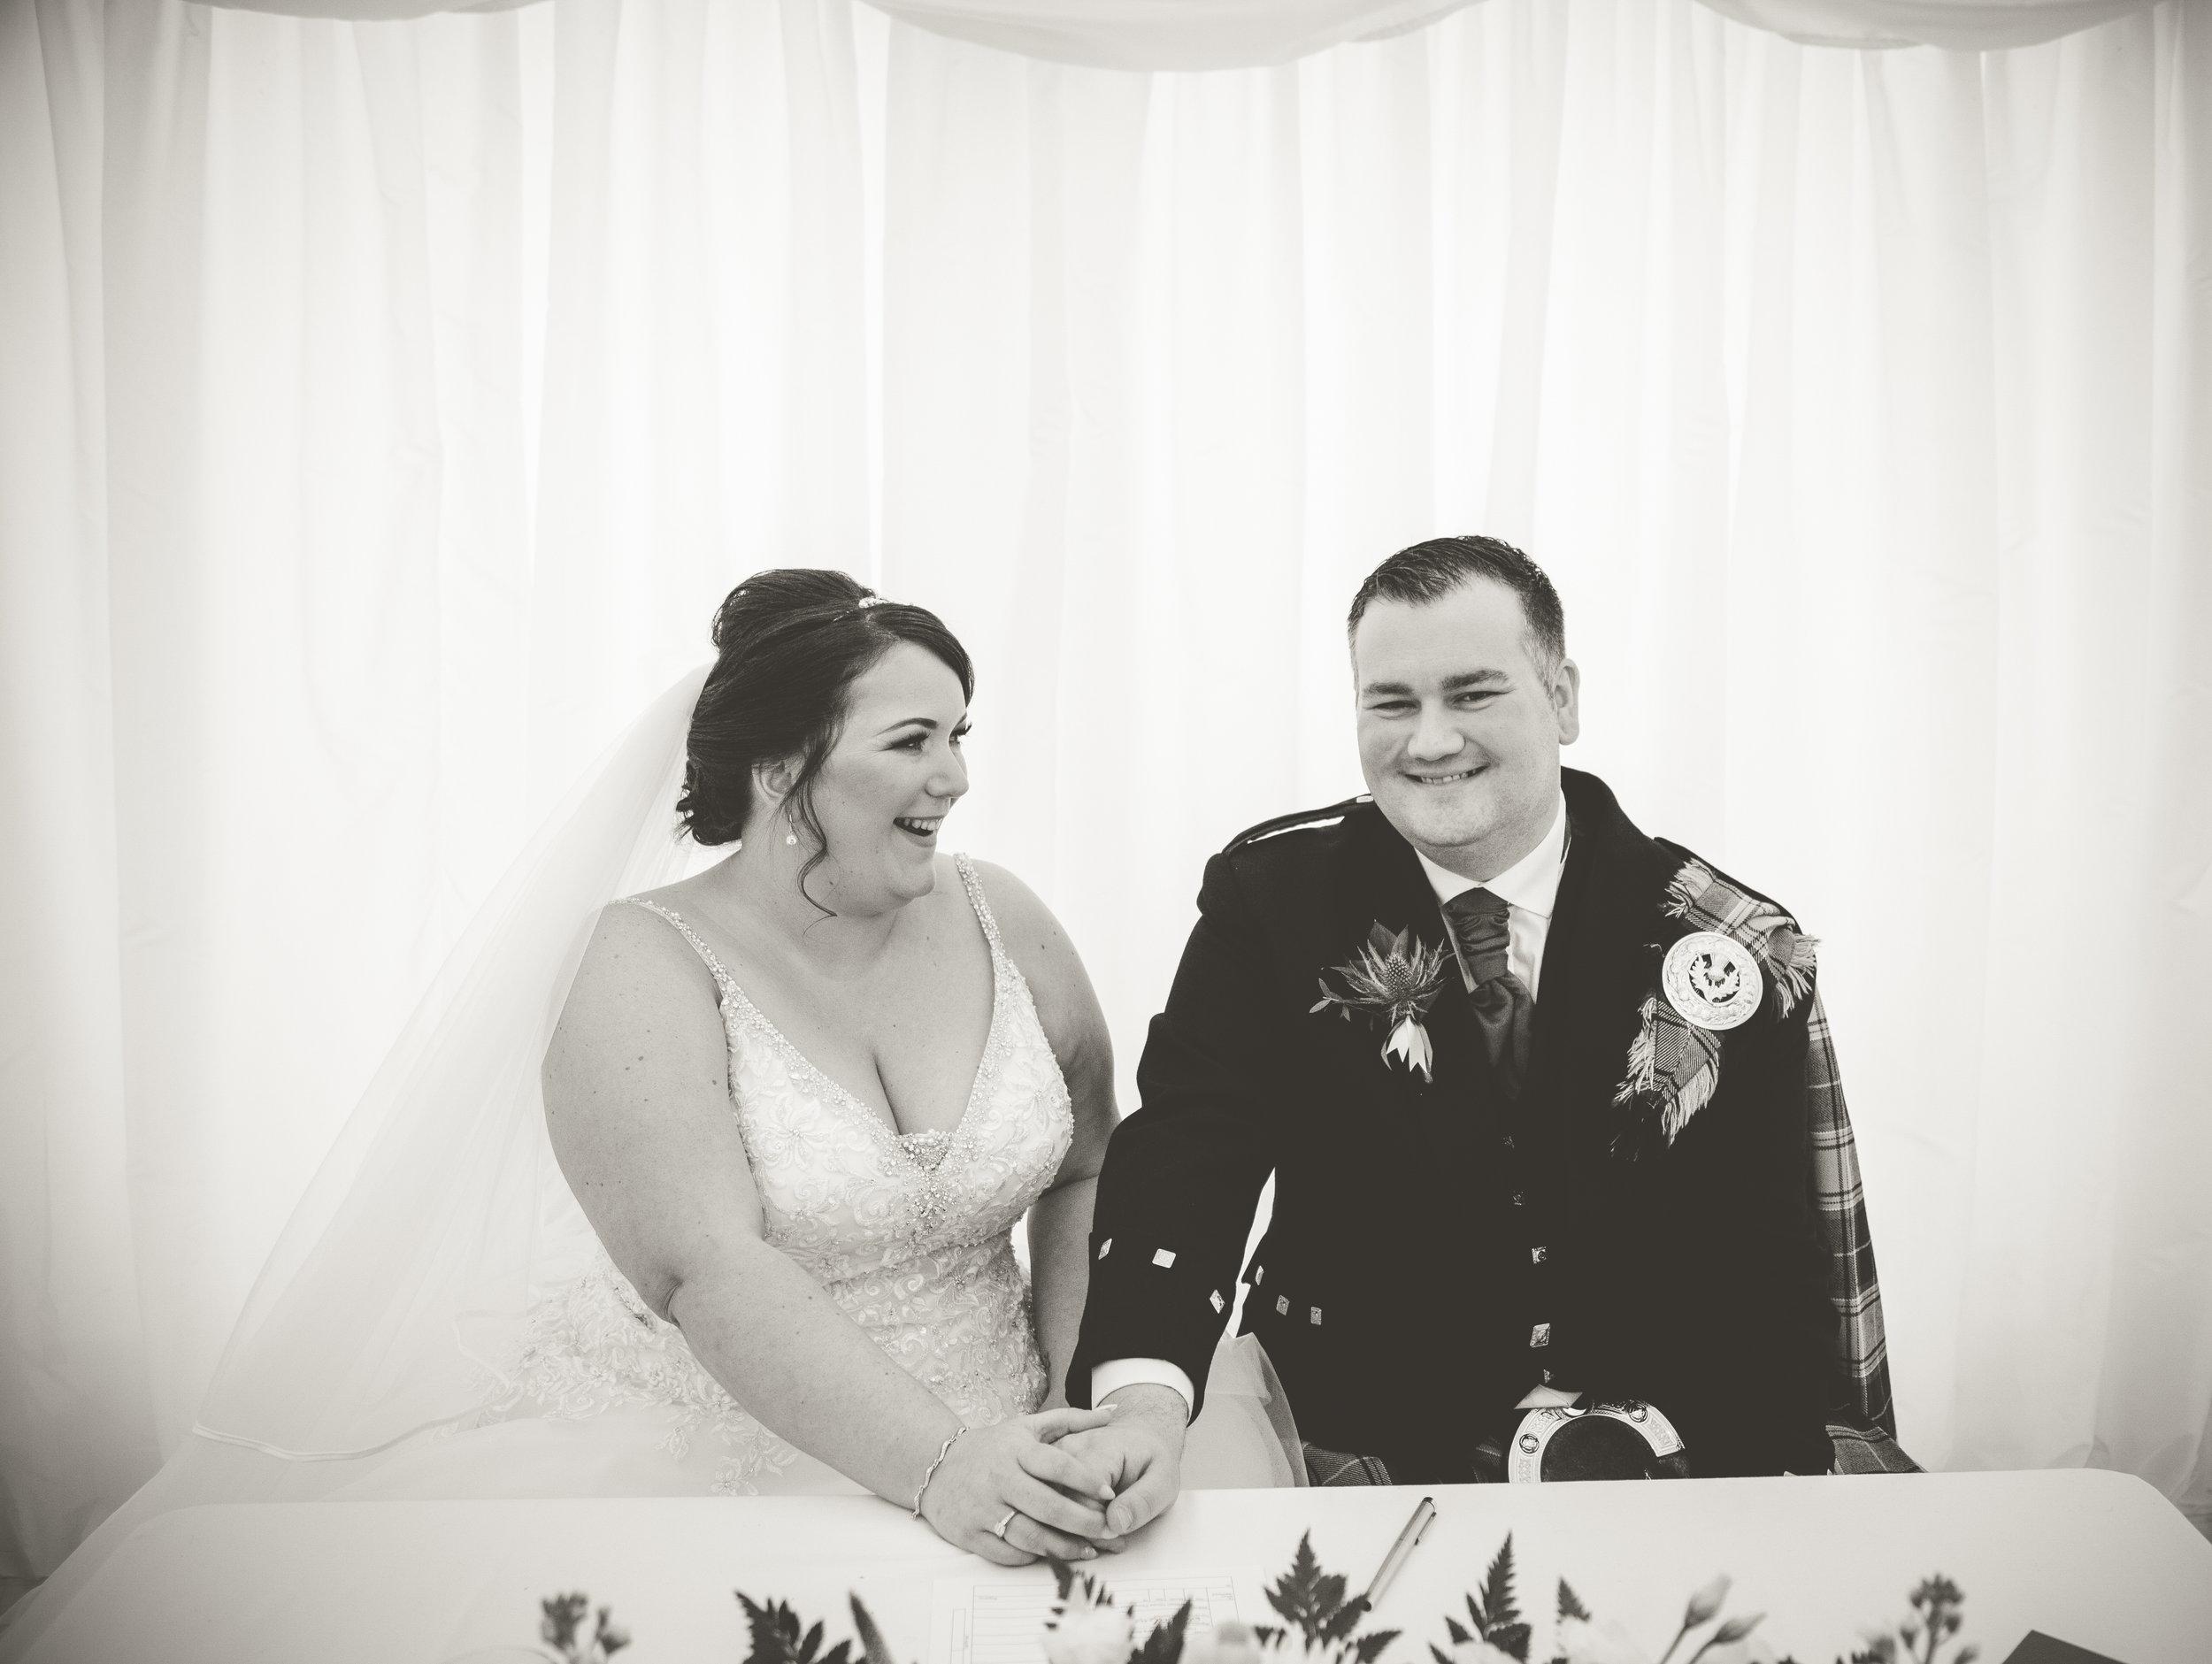 Mr&MrsBrown_091-2.jpg